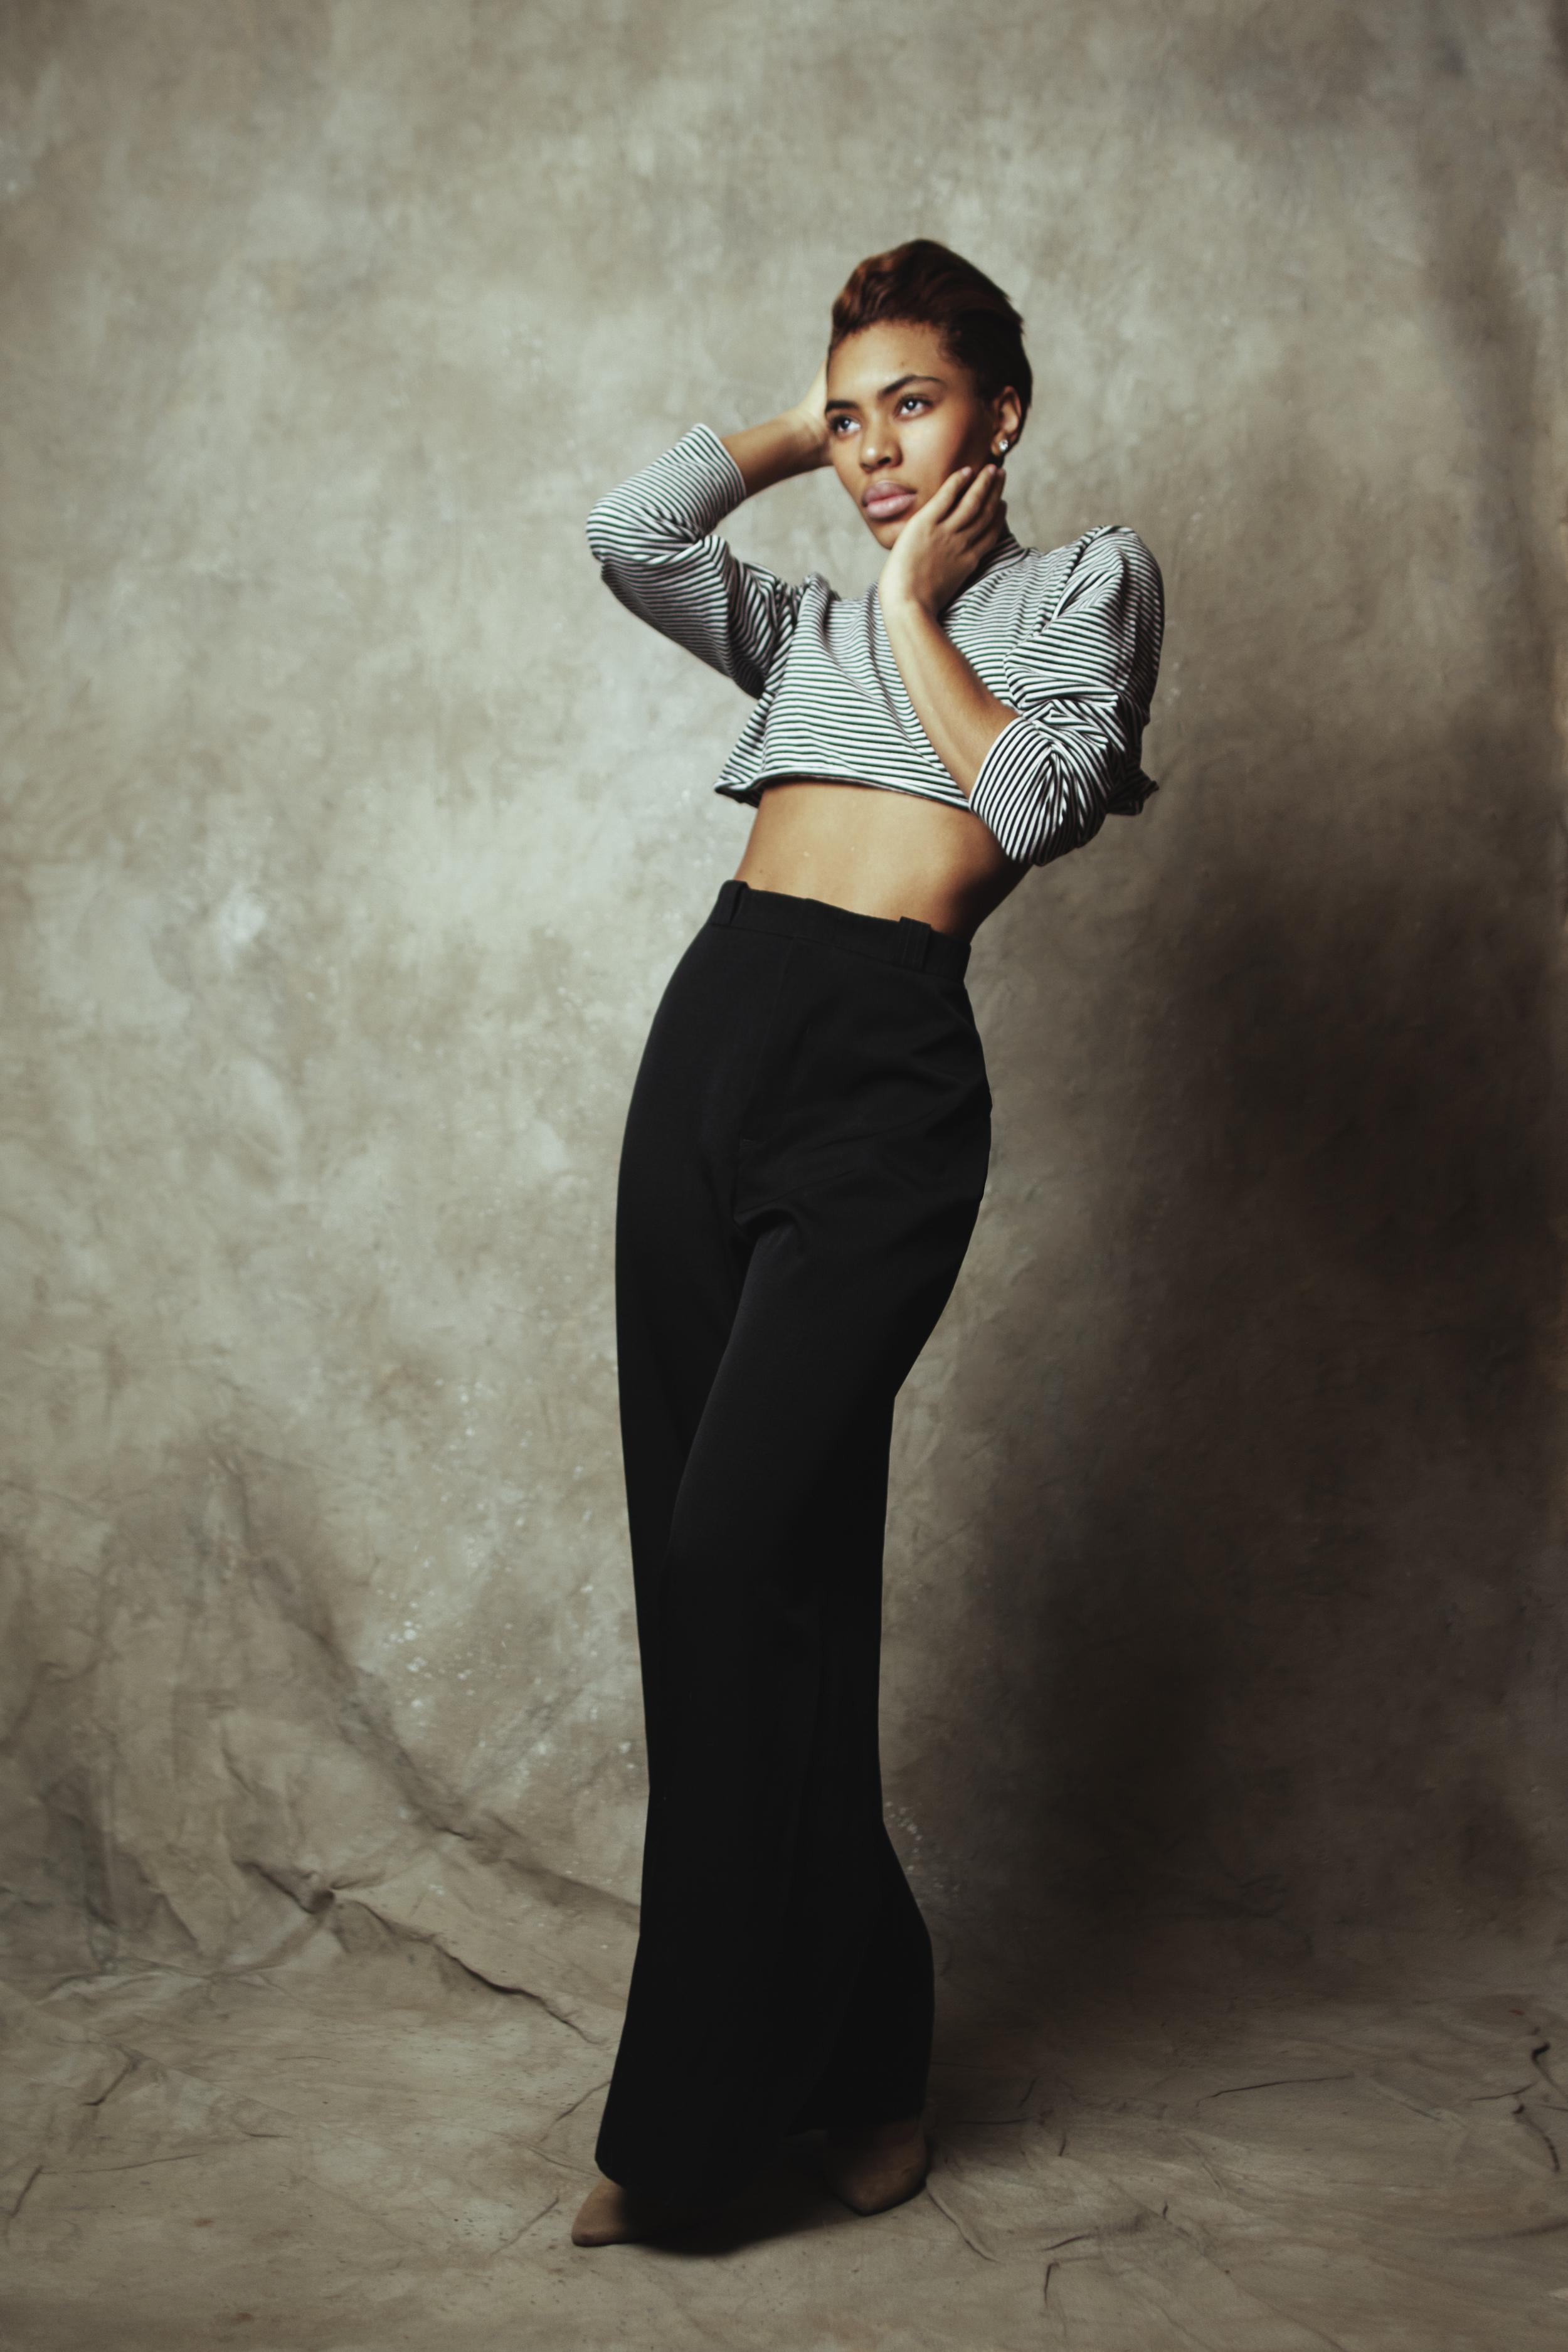 KateWoodmanPhotography-14.jpg